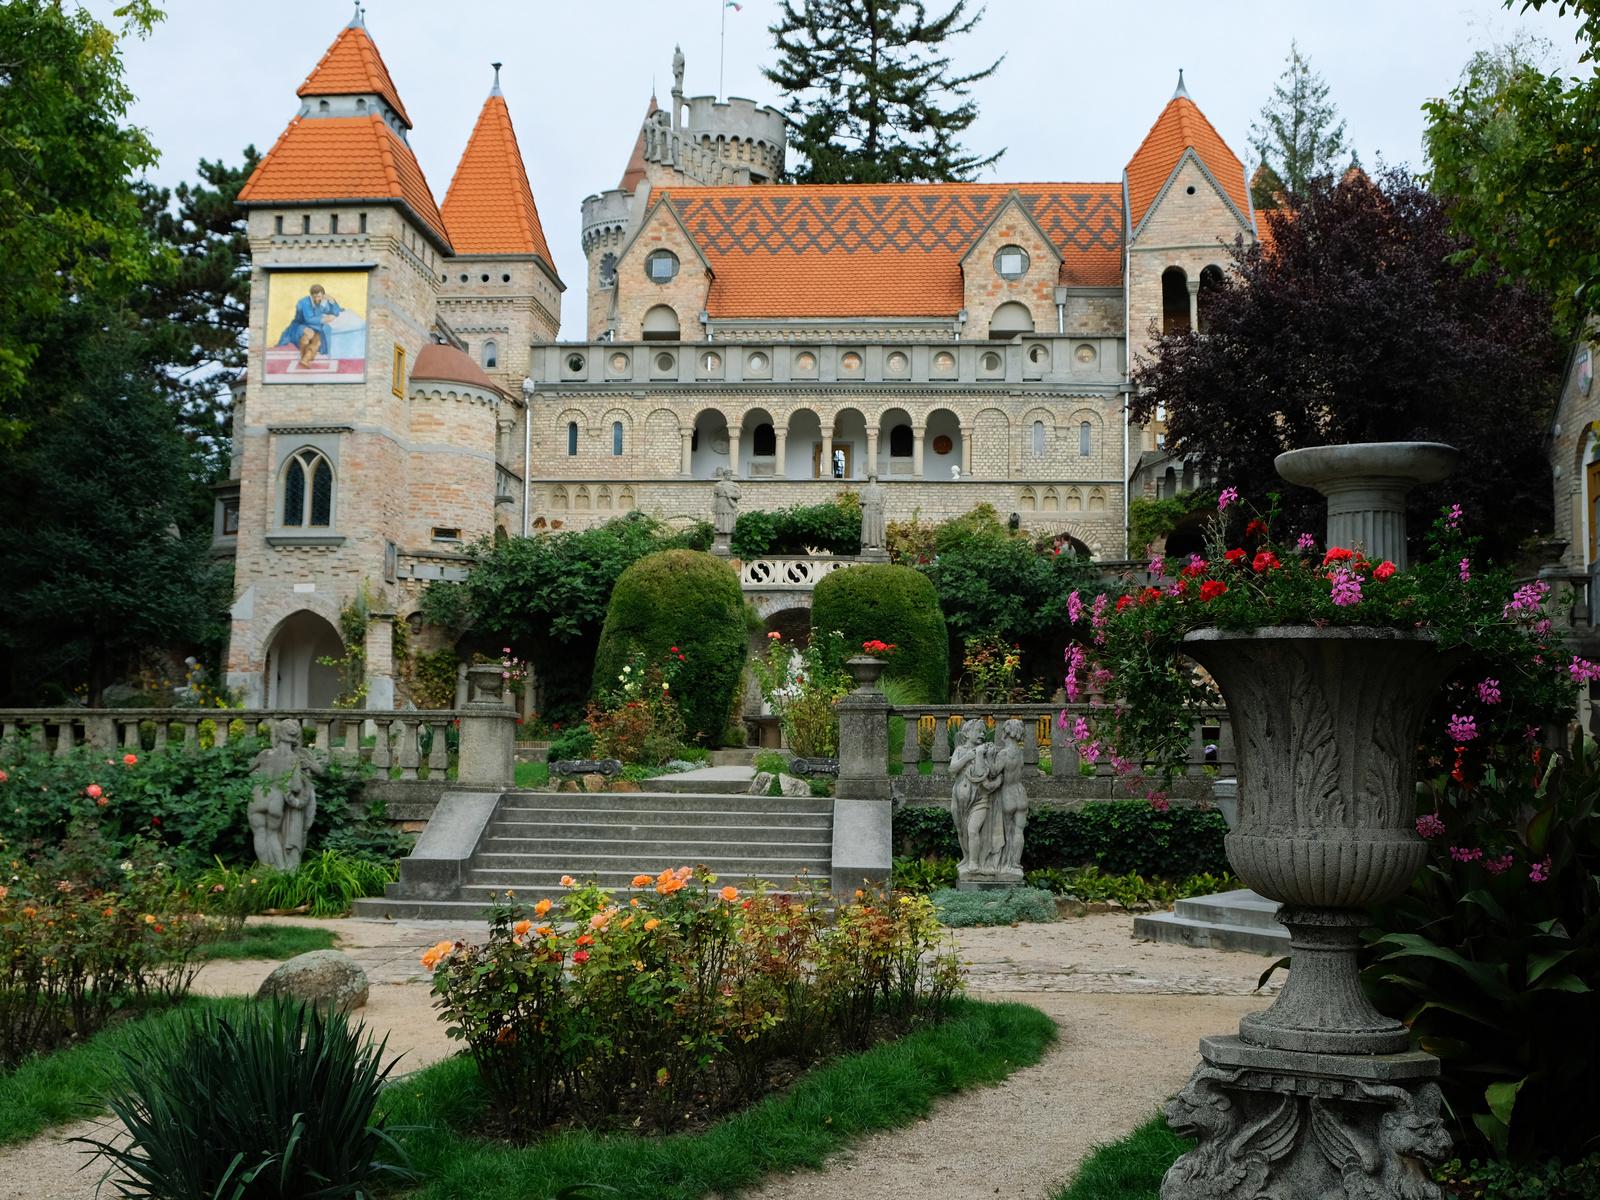 венгрия, замок, парк, скульптуры, bory castle, лестница, город